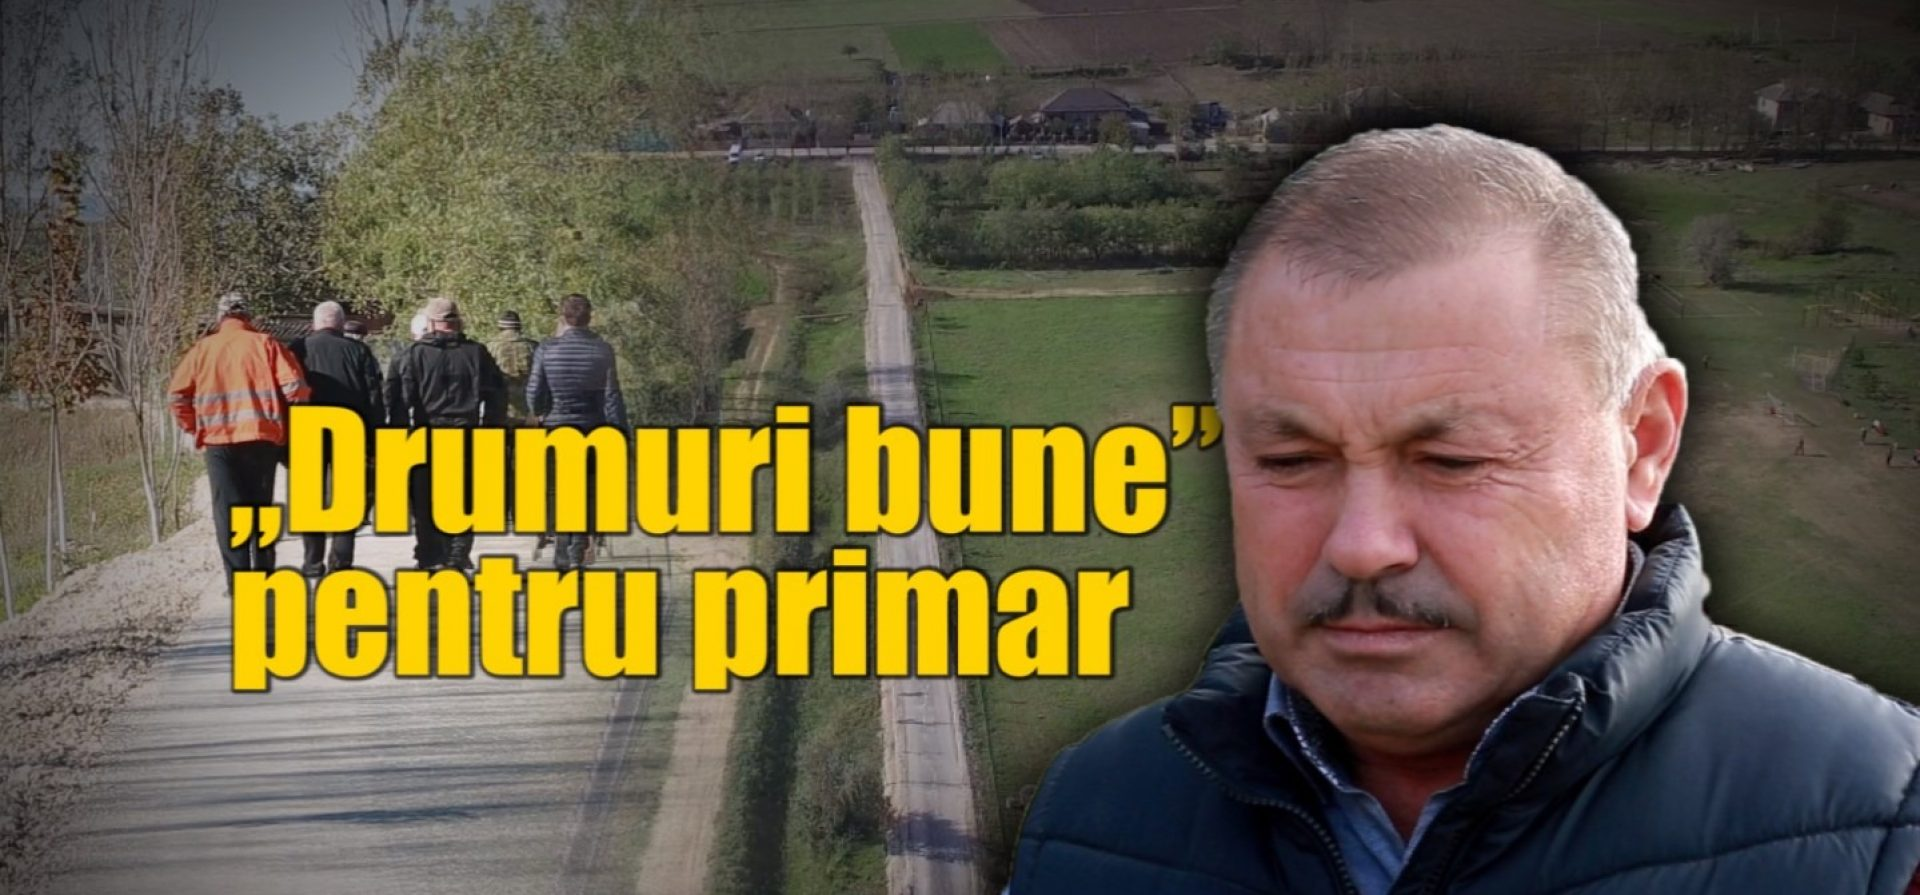 """Drumuri bune"" pentru primar"